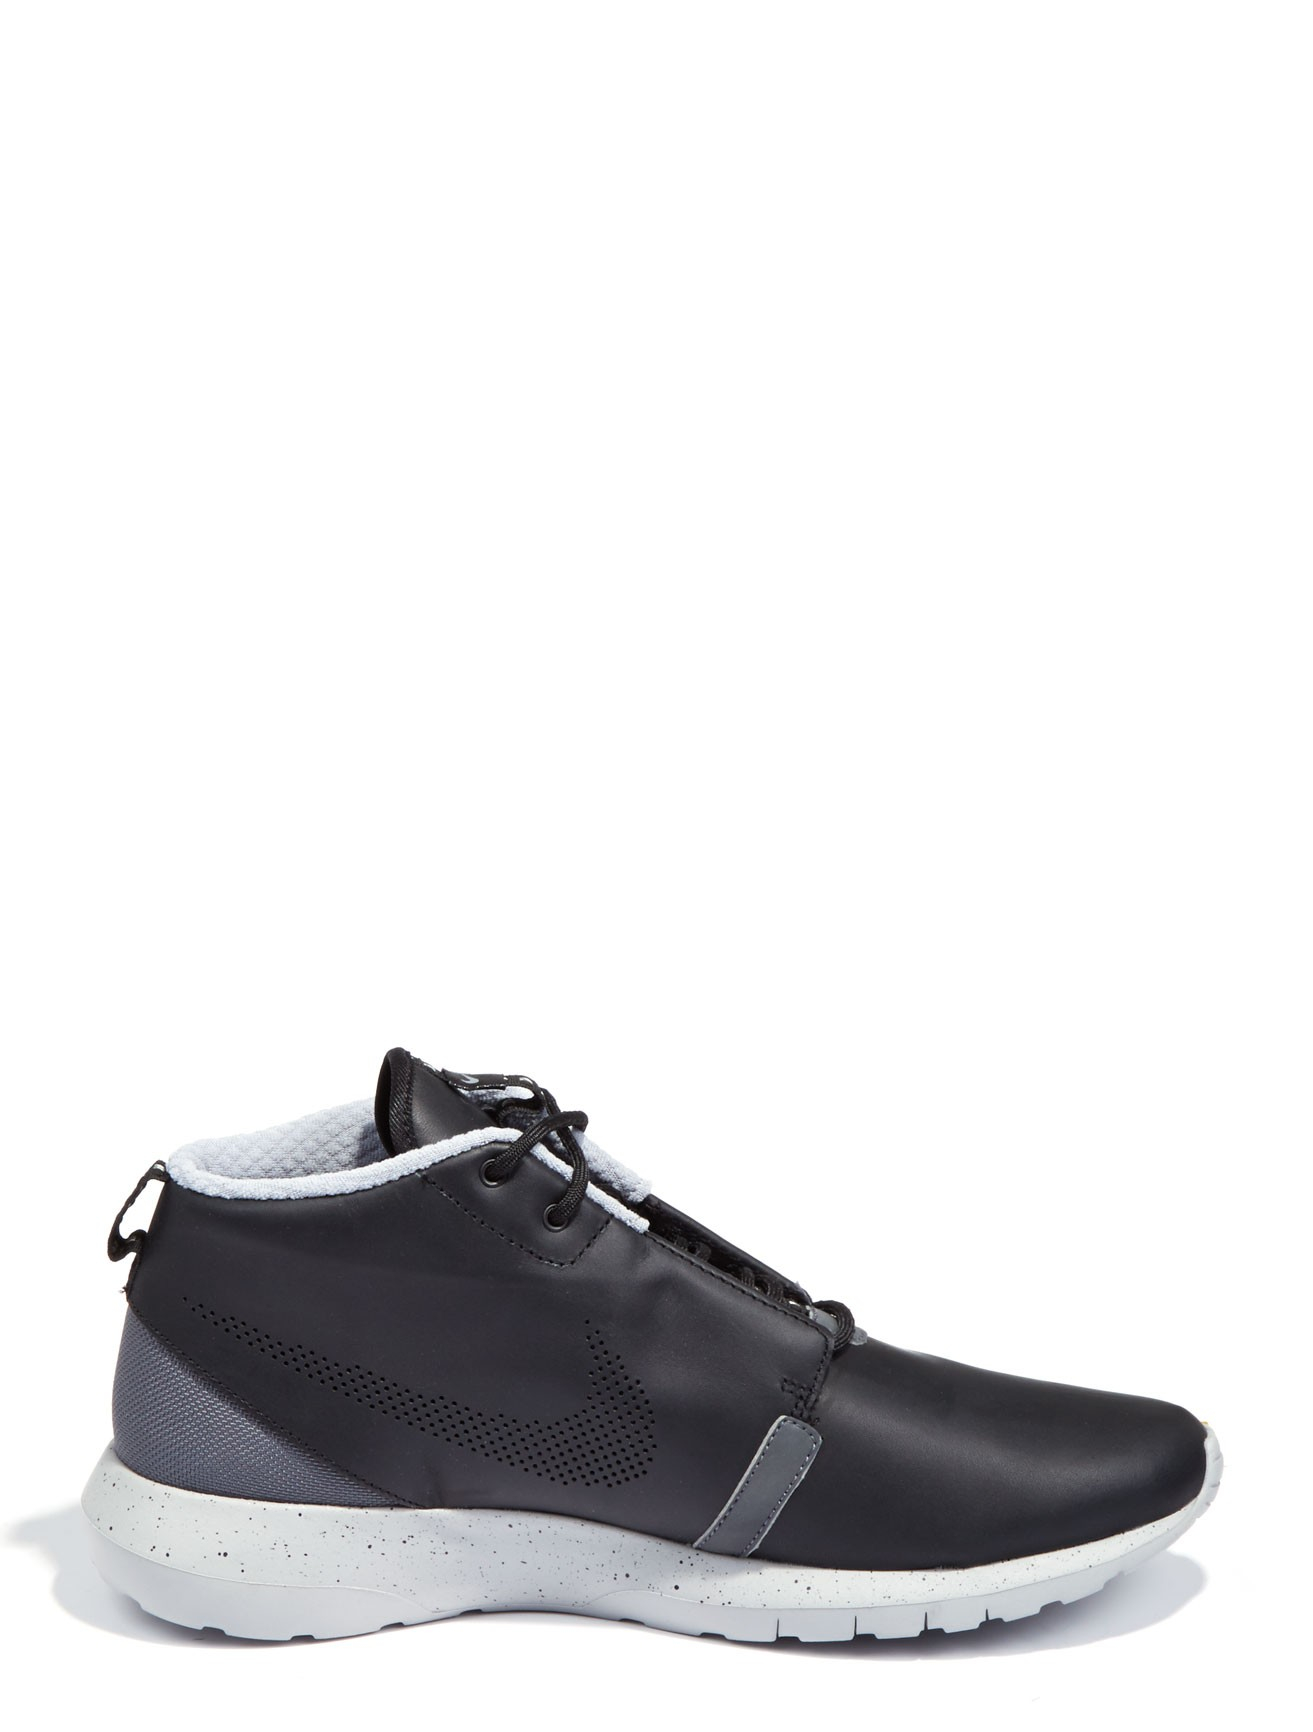 nike leather roshe run sneaker boots in black for lyst